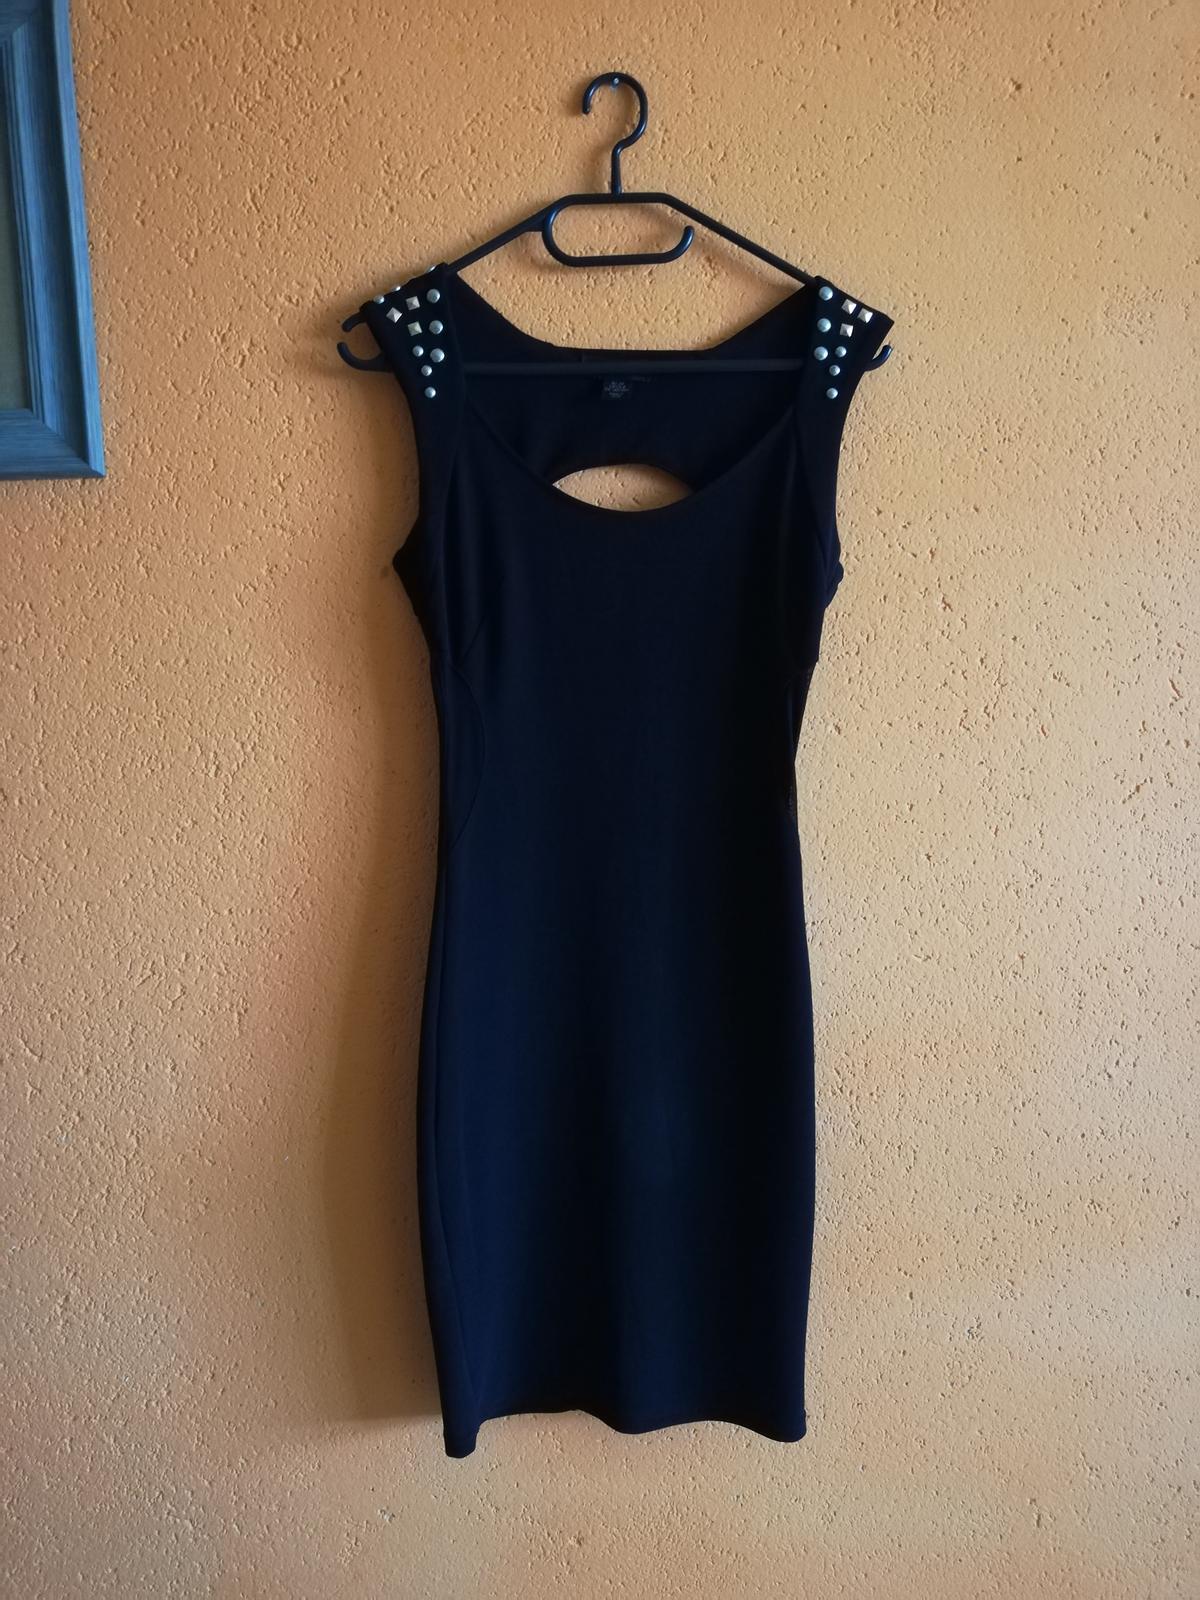 Čierne šaty 34-38 - Obrázok č. 1